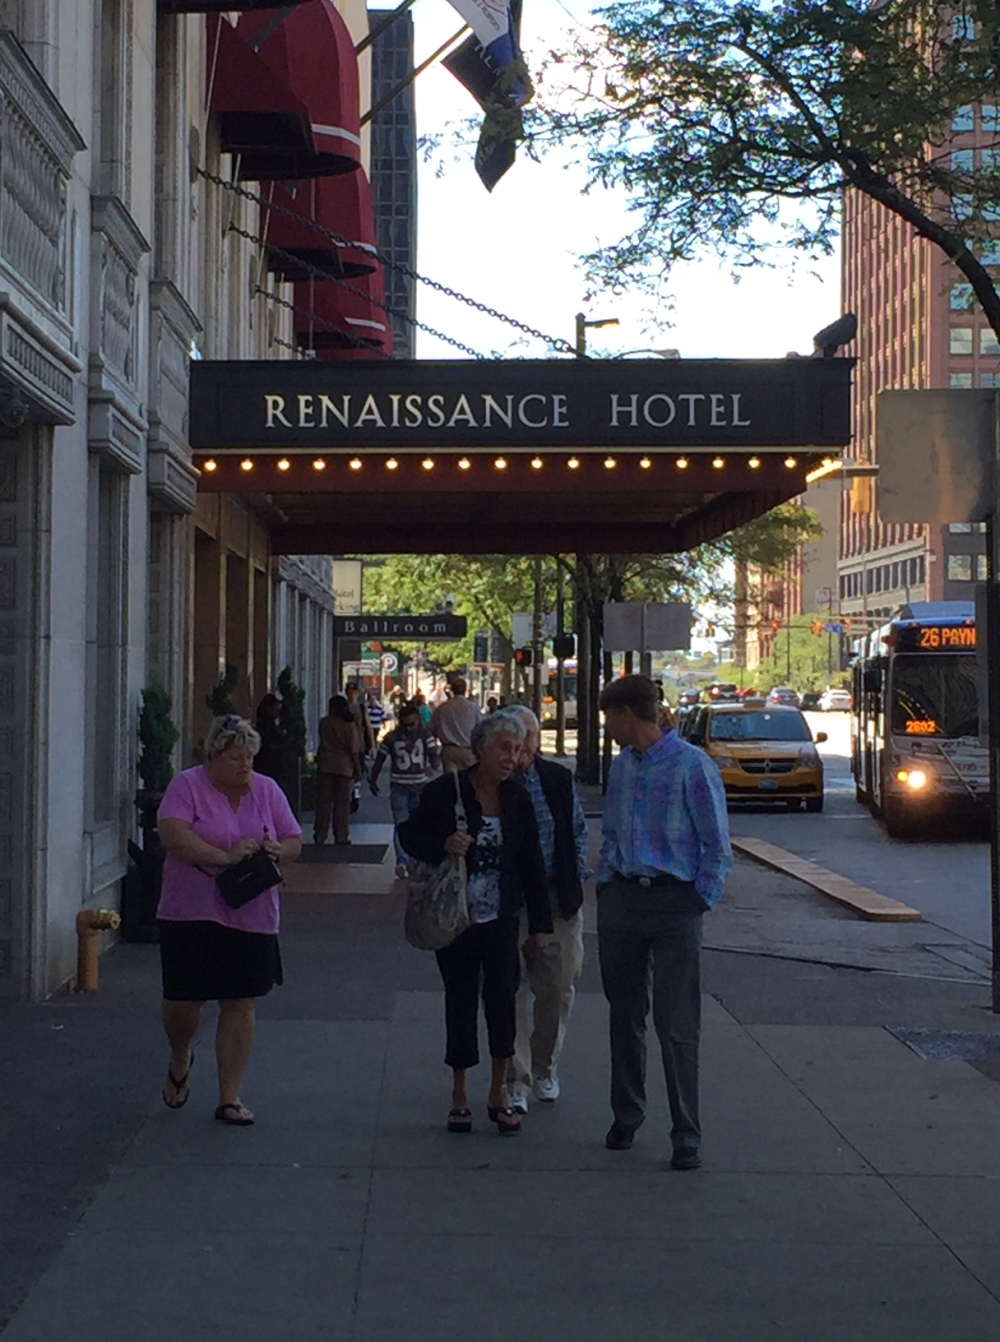 renaissance-hotel-1